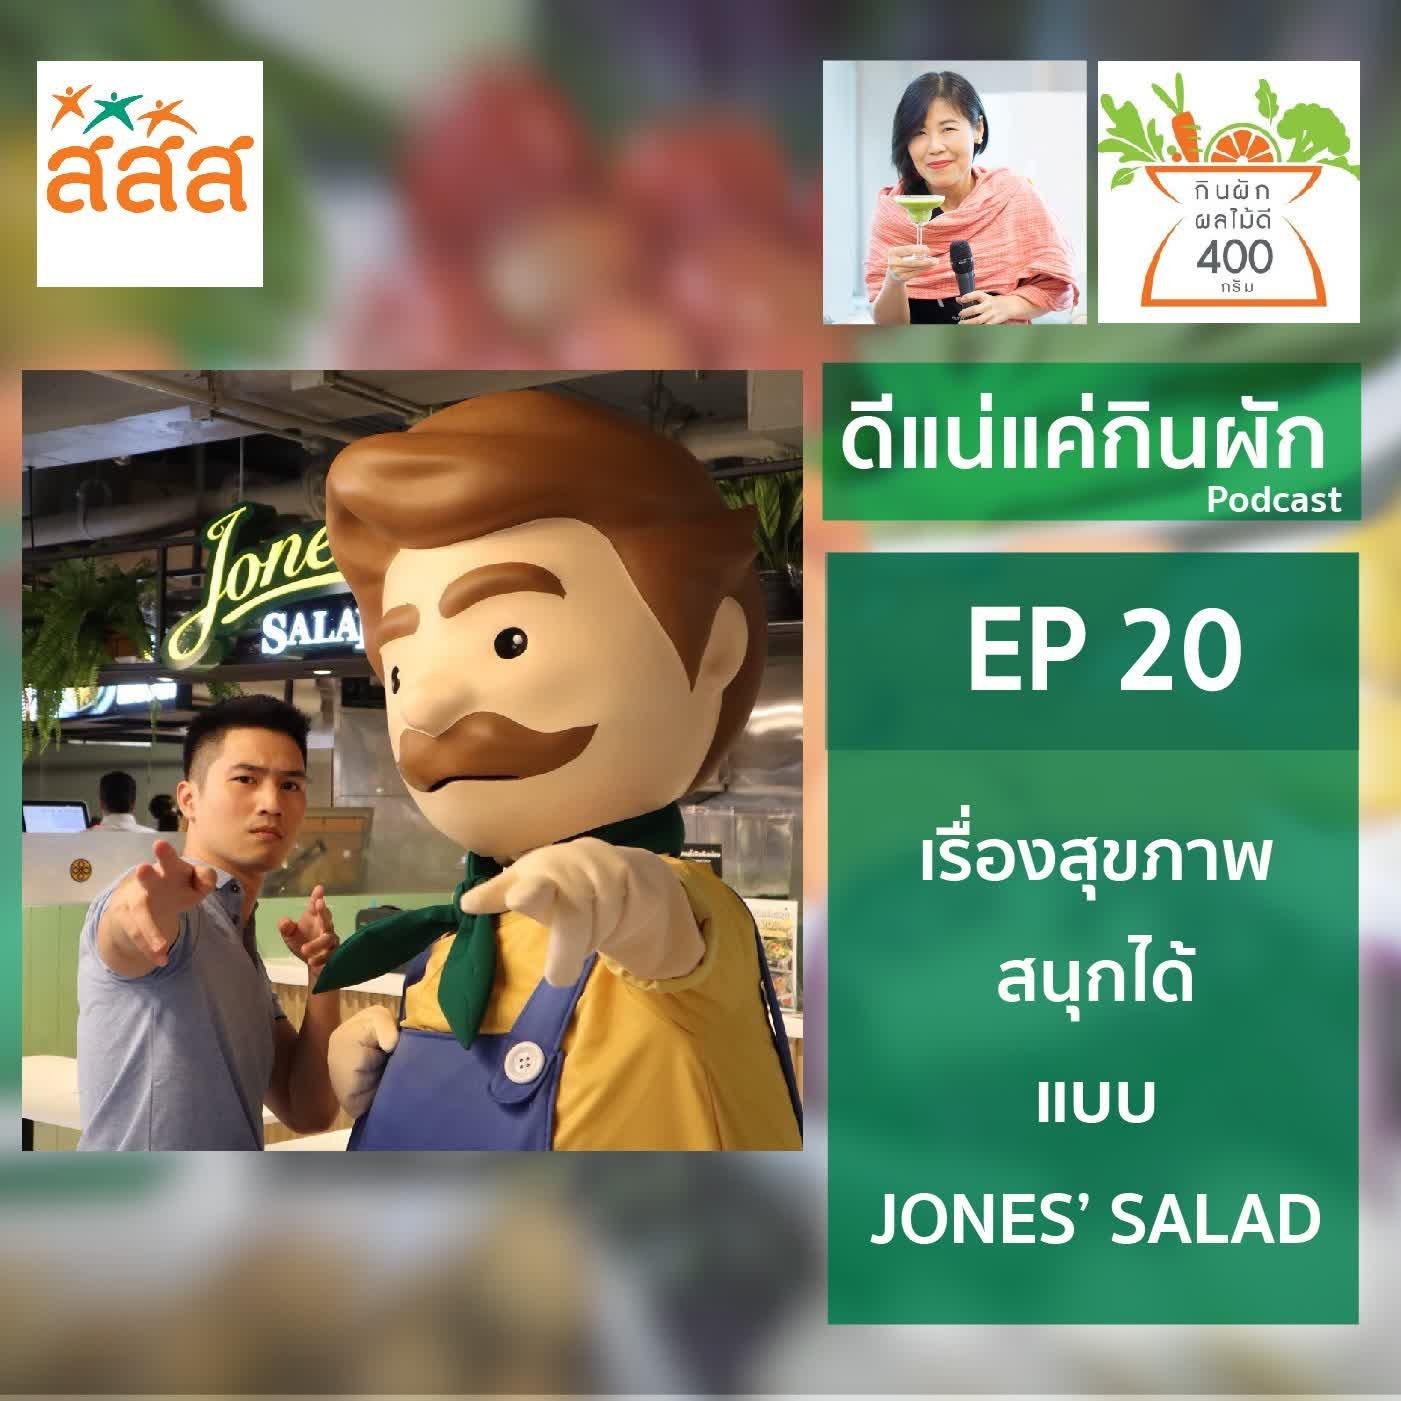 EP020 : เรื่องสุขภาพ สนุกได้ แบบ Jones' salad